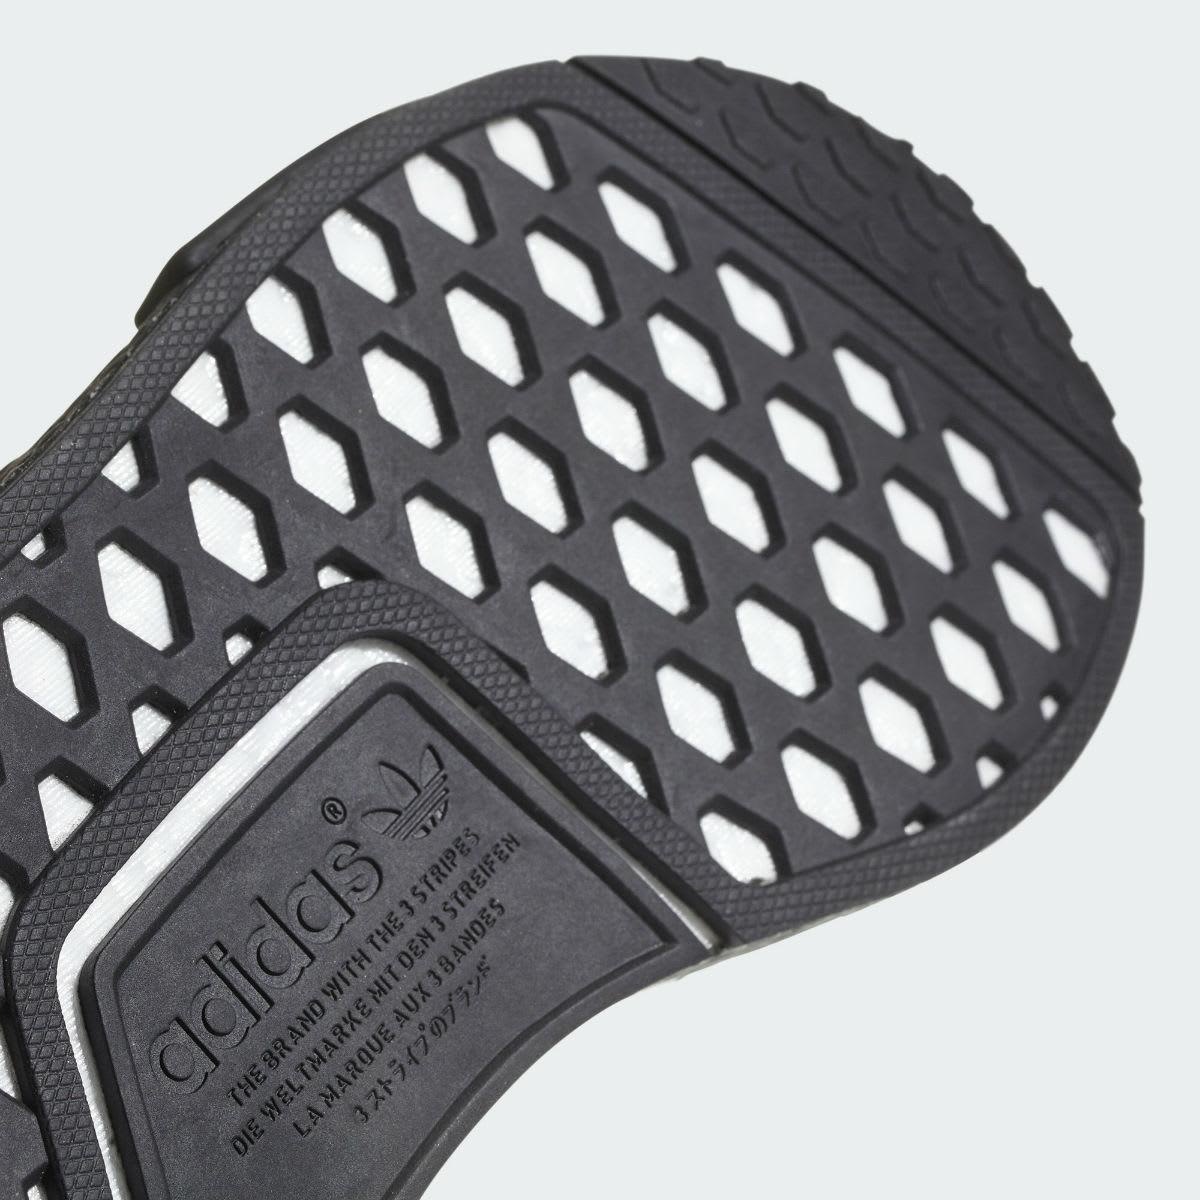 Neighborhood x Adidas NMD R1 Release Date DA8835 Outsole